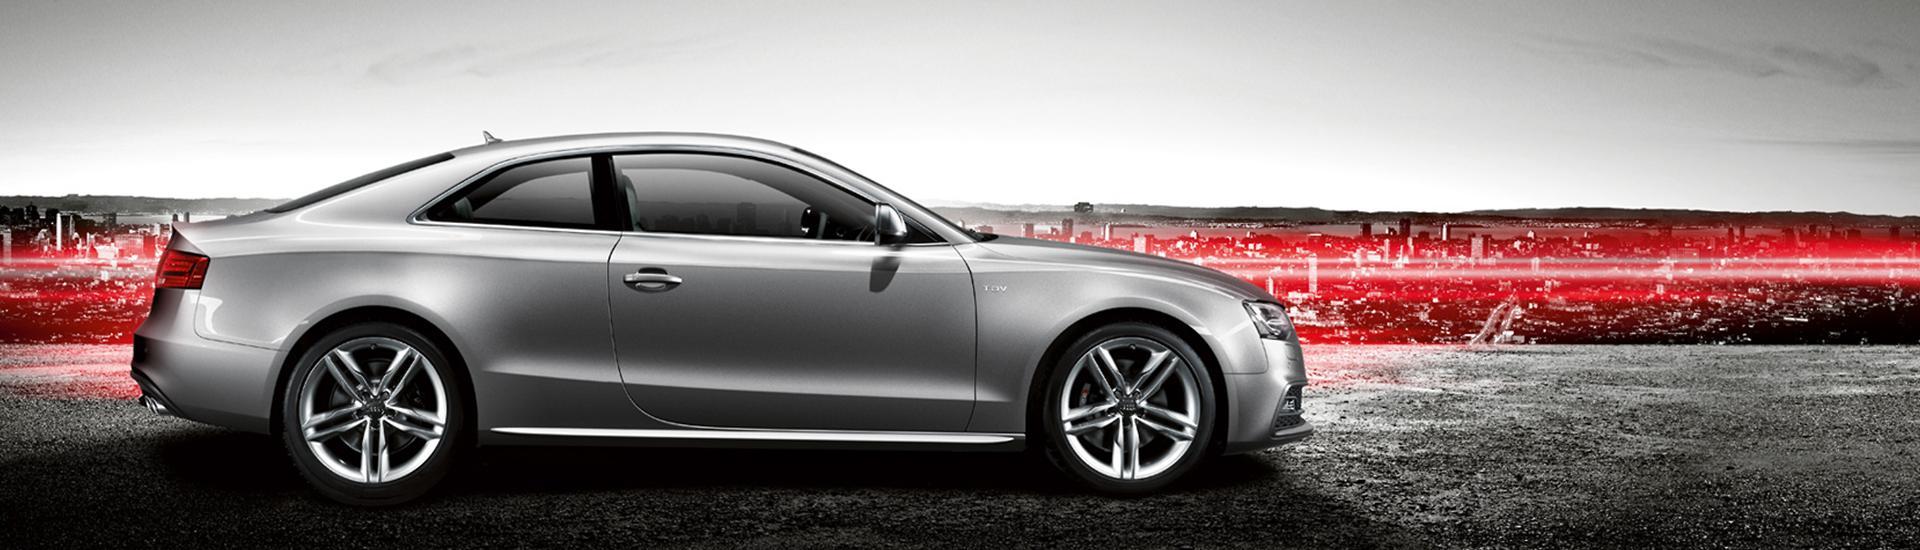 new audi s5 coupe cars for sale. Black Bedroom Furniture Sets. Home Design Ideas